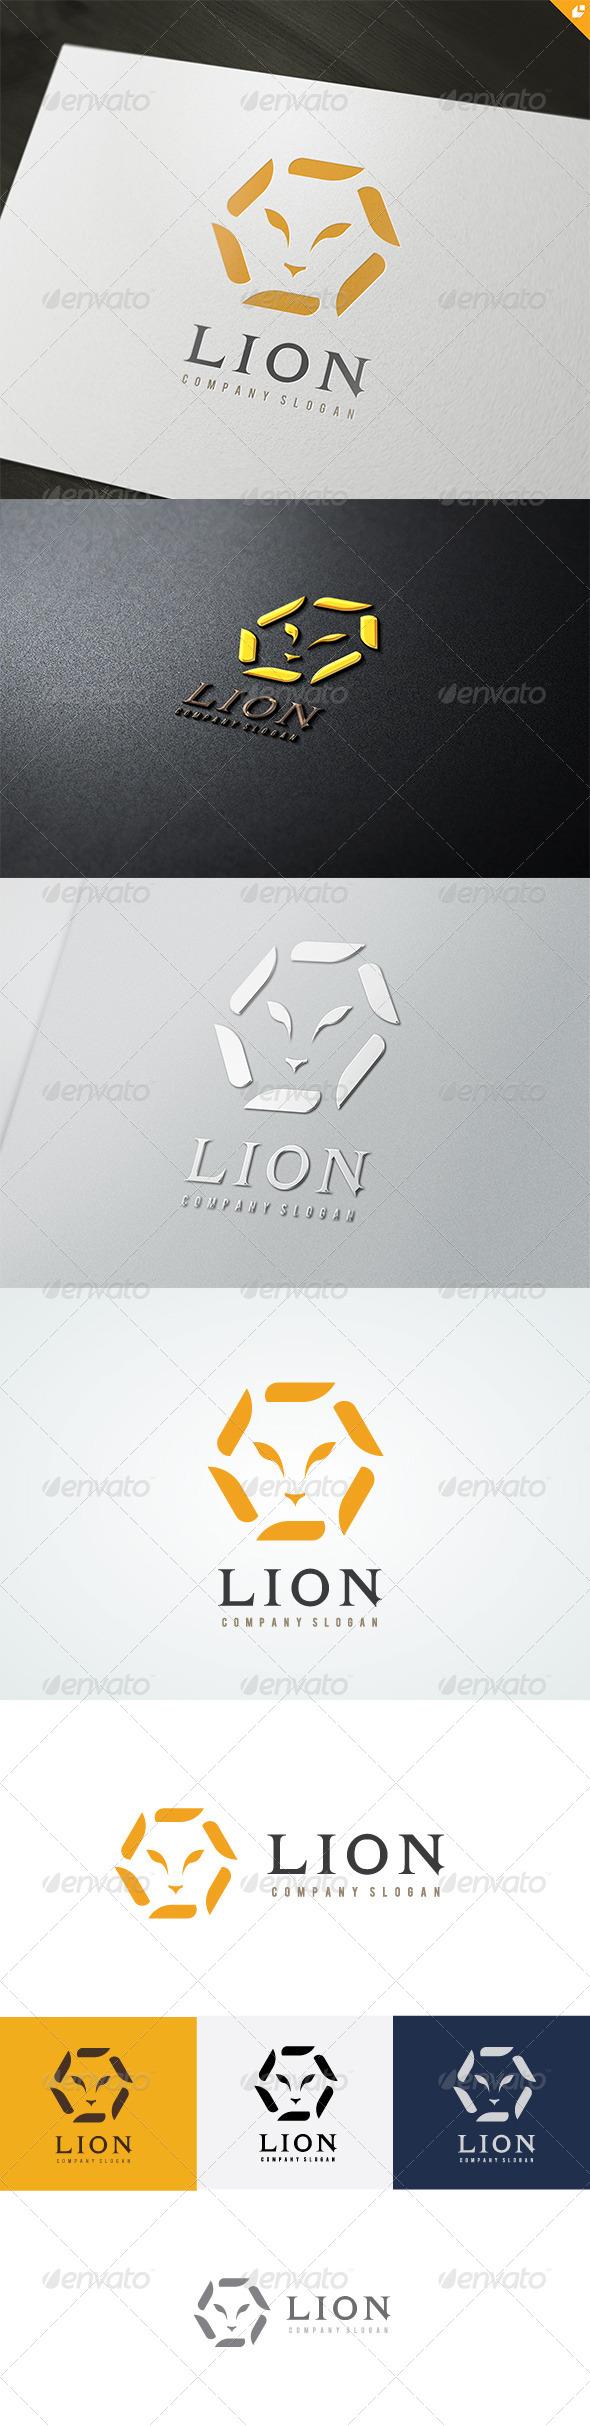 Lion Company Logo - Crests Logo Templates